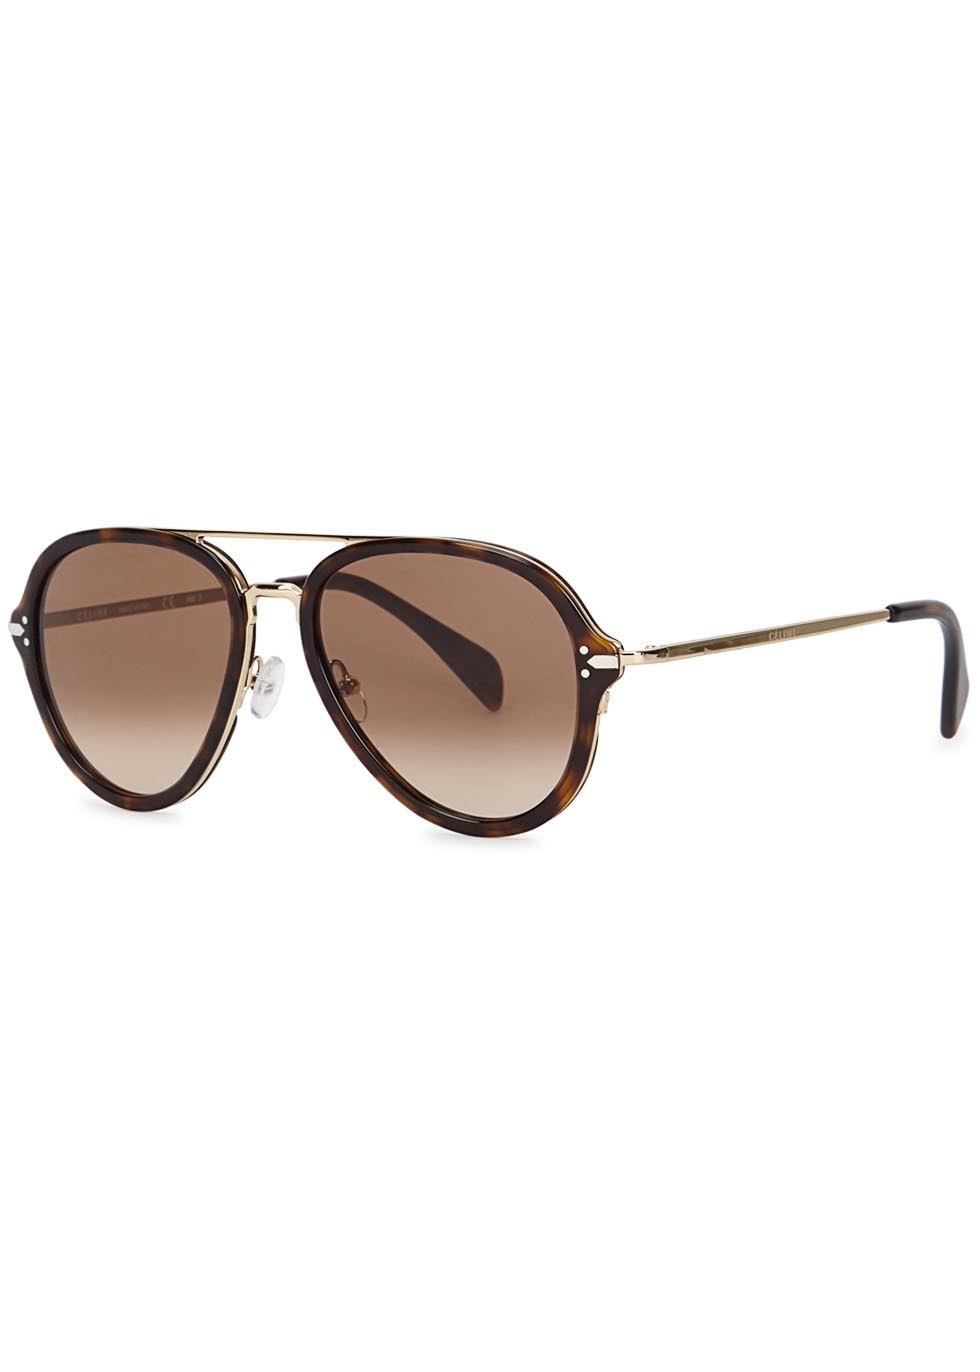 Drop tortoiseshell aviator-style sunglasses - Celine